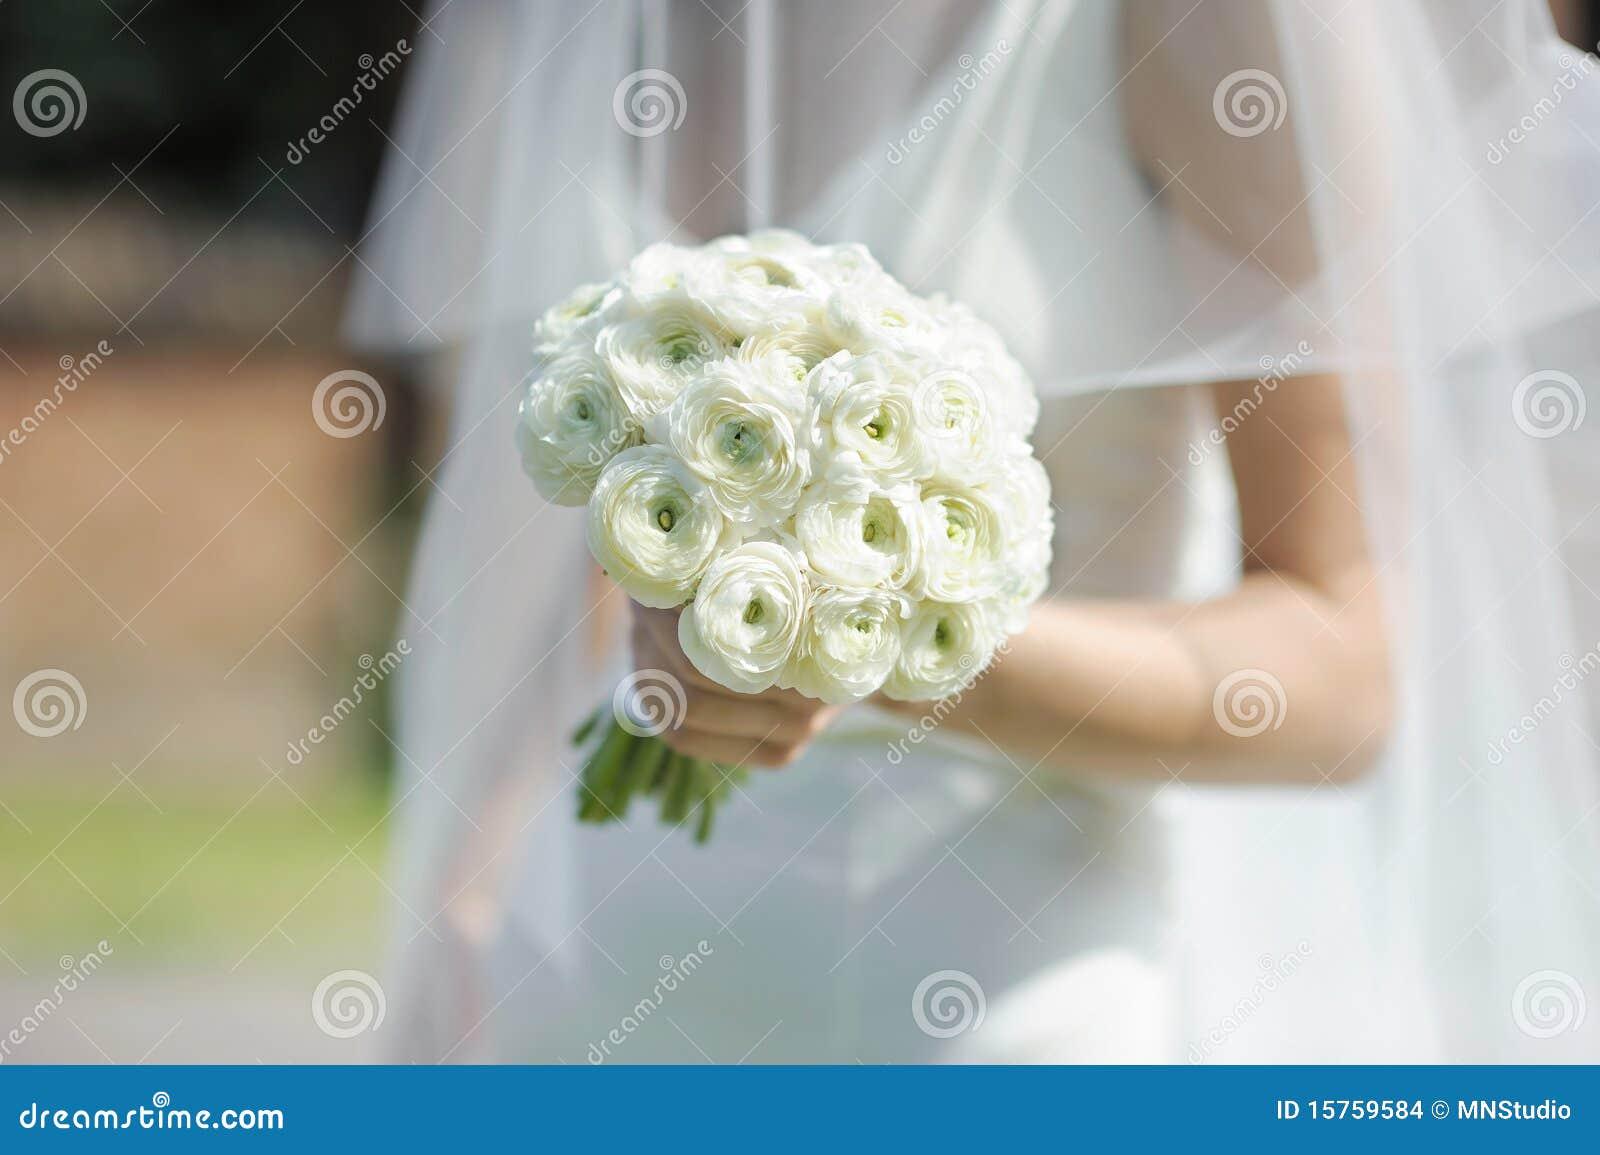 Bride Holding White Wedding Flowers Bouquet Stock Photo Image Of